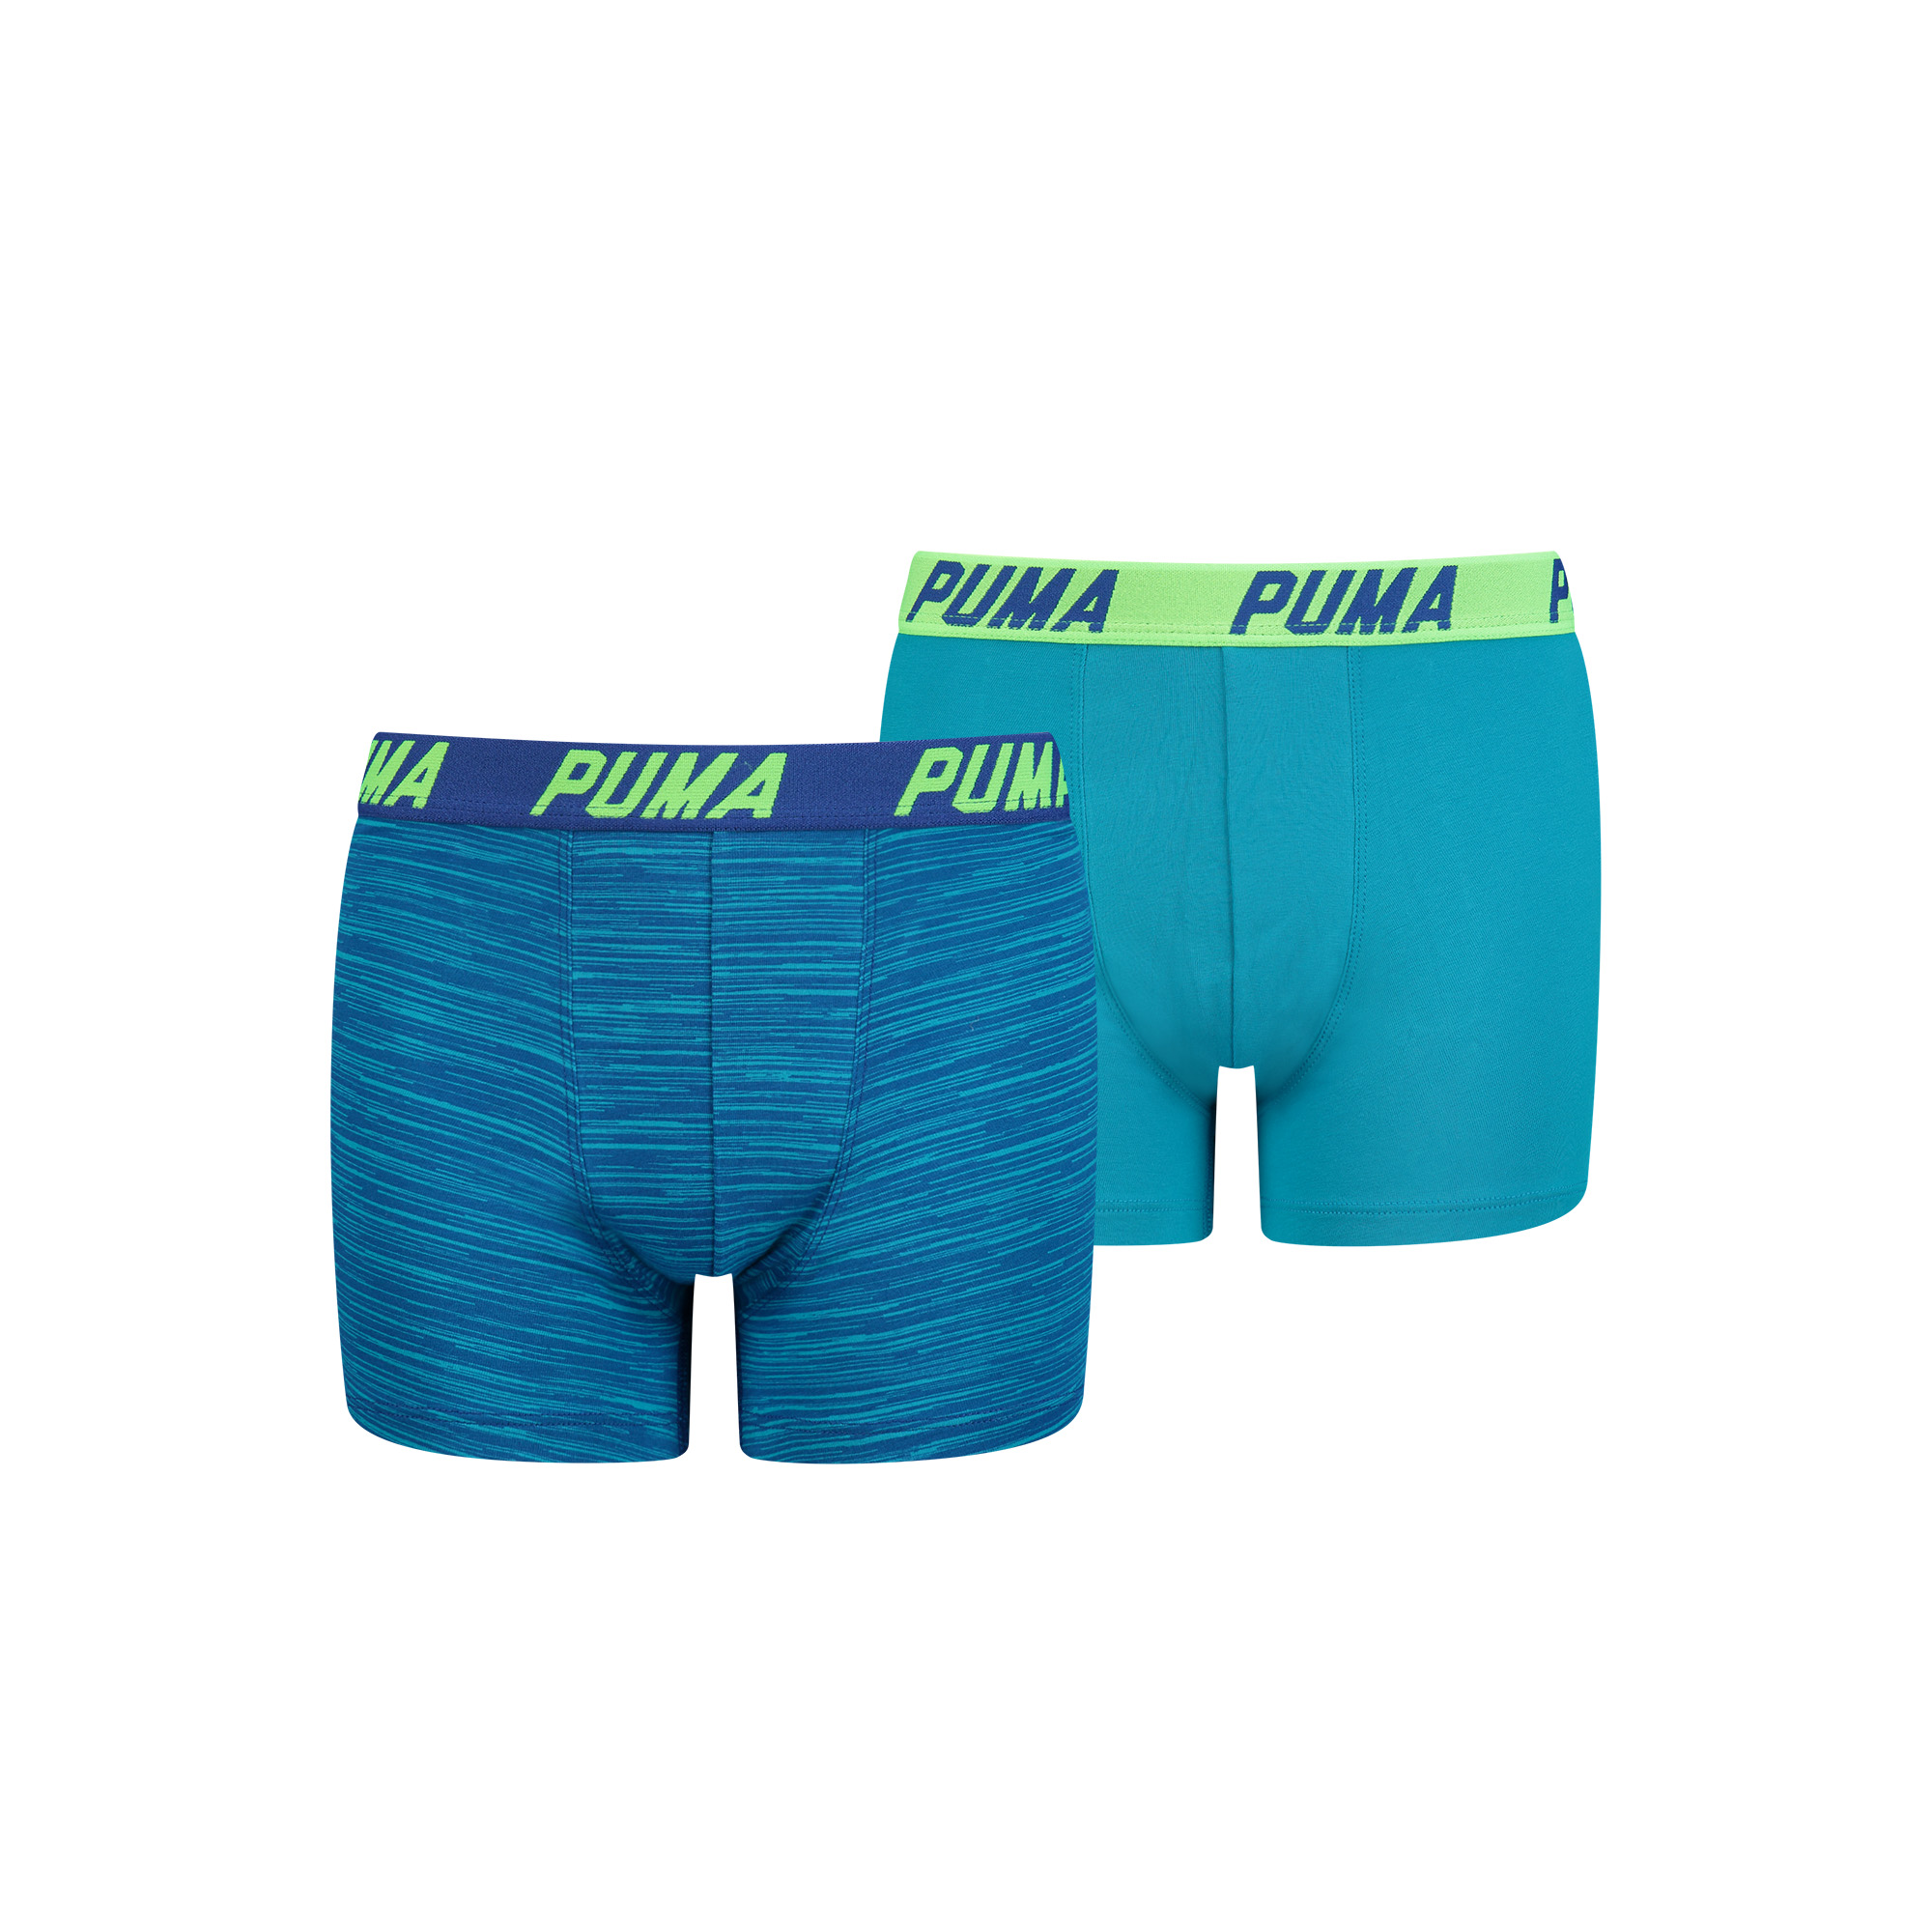 Puma Basic Boxershorts Space Dye 2P Aqua Blauw